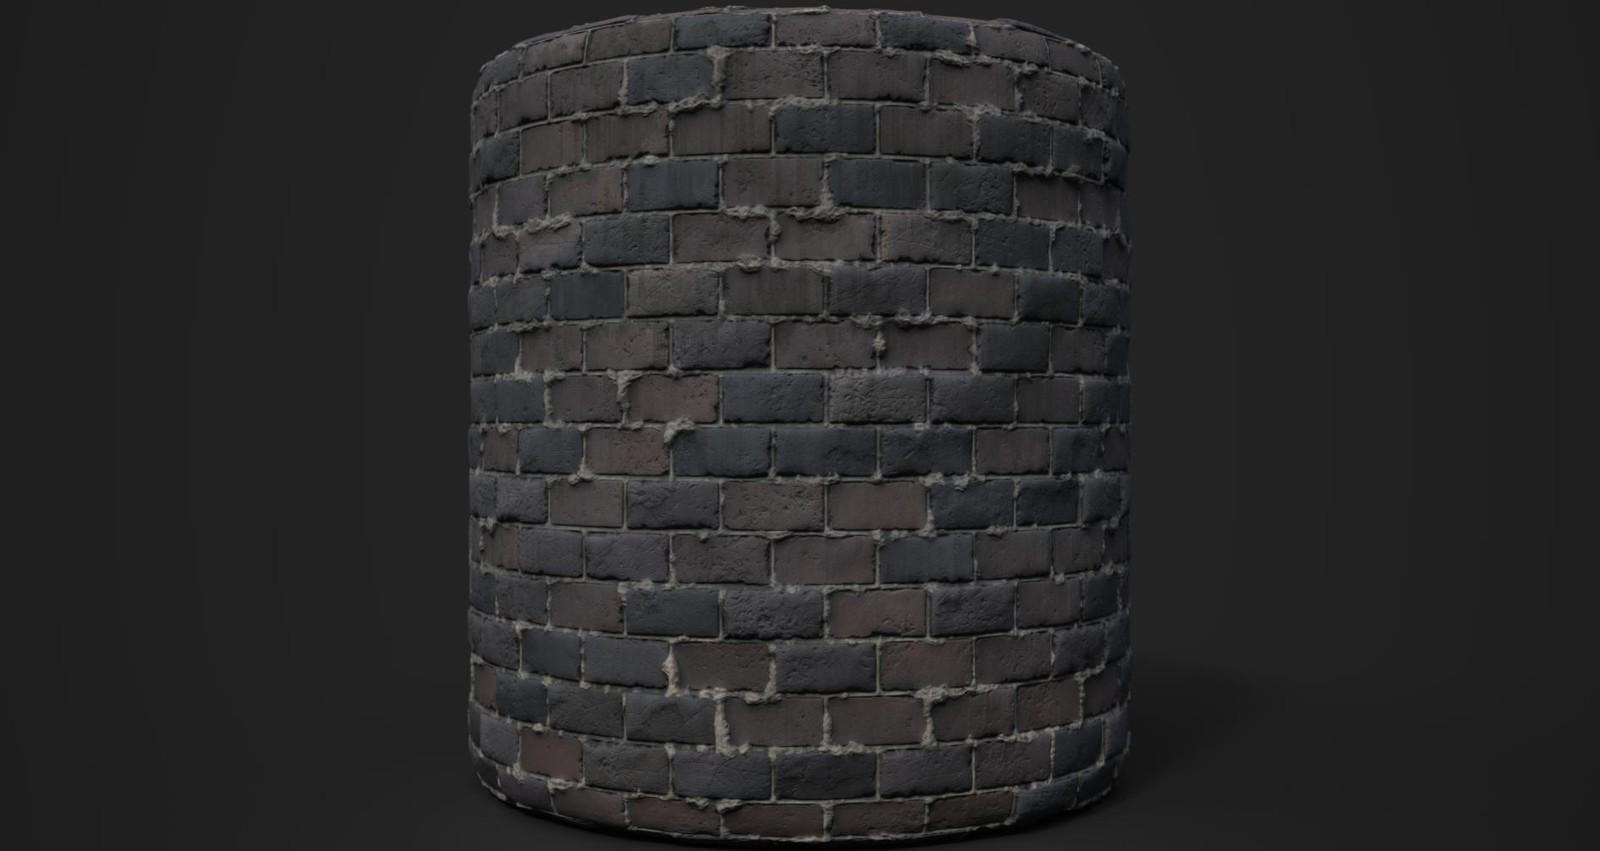 Basement bricks.